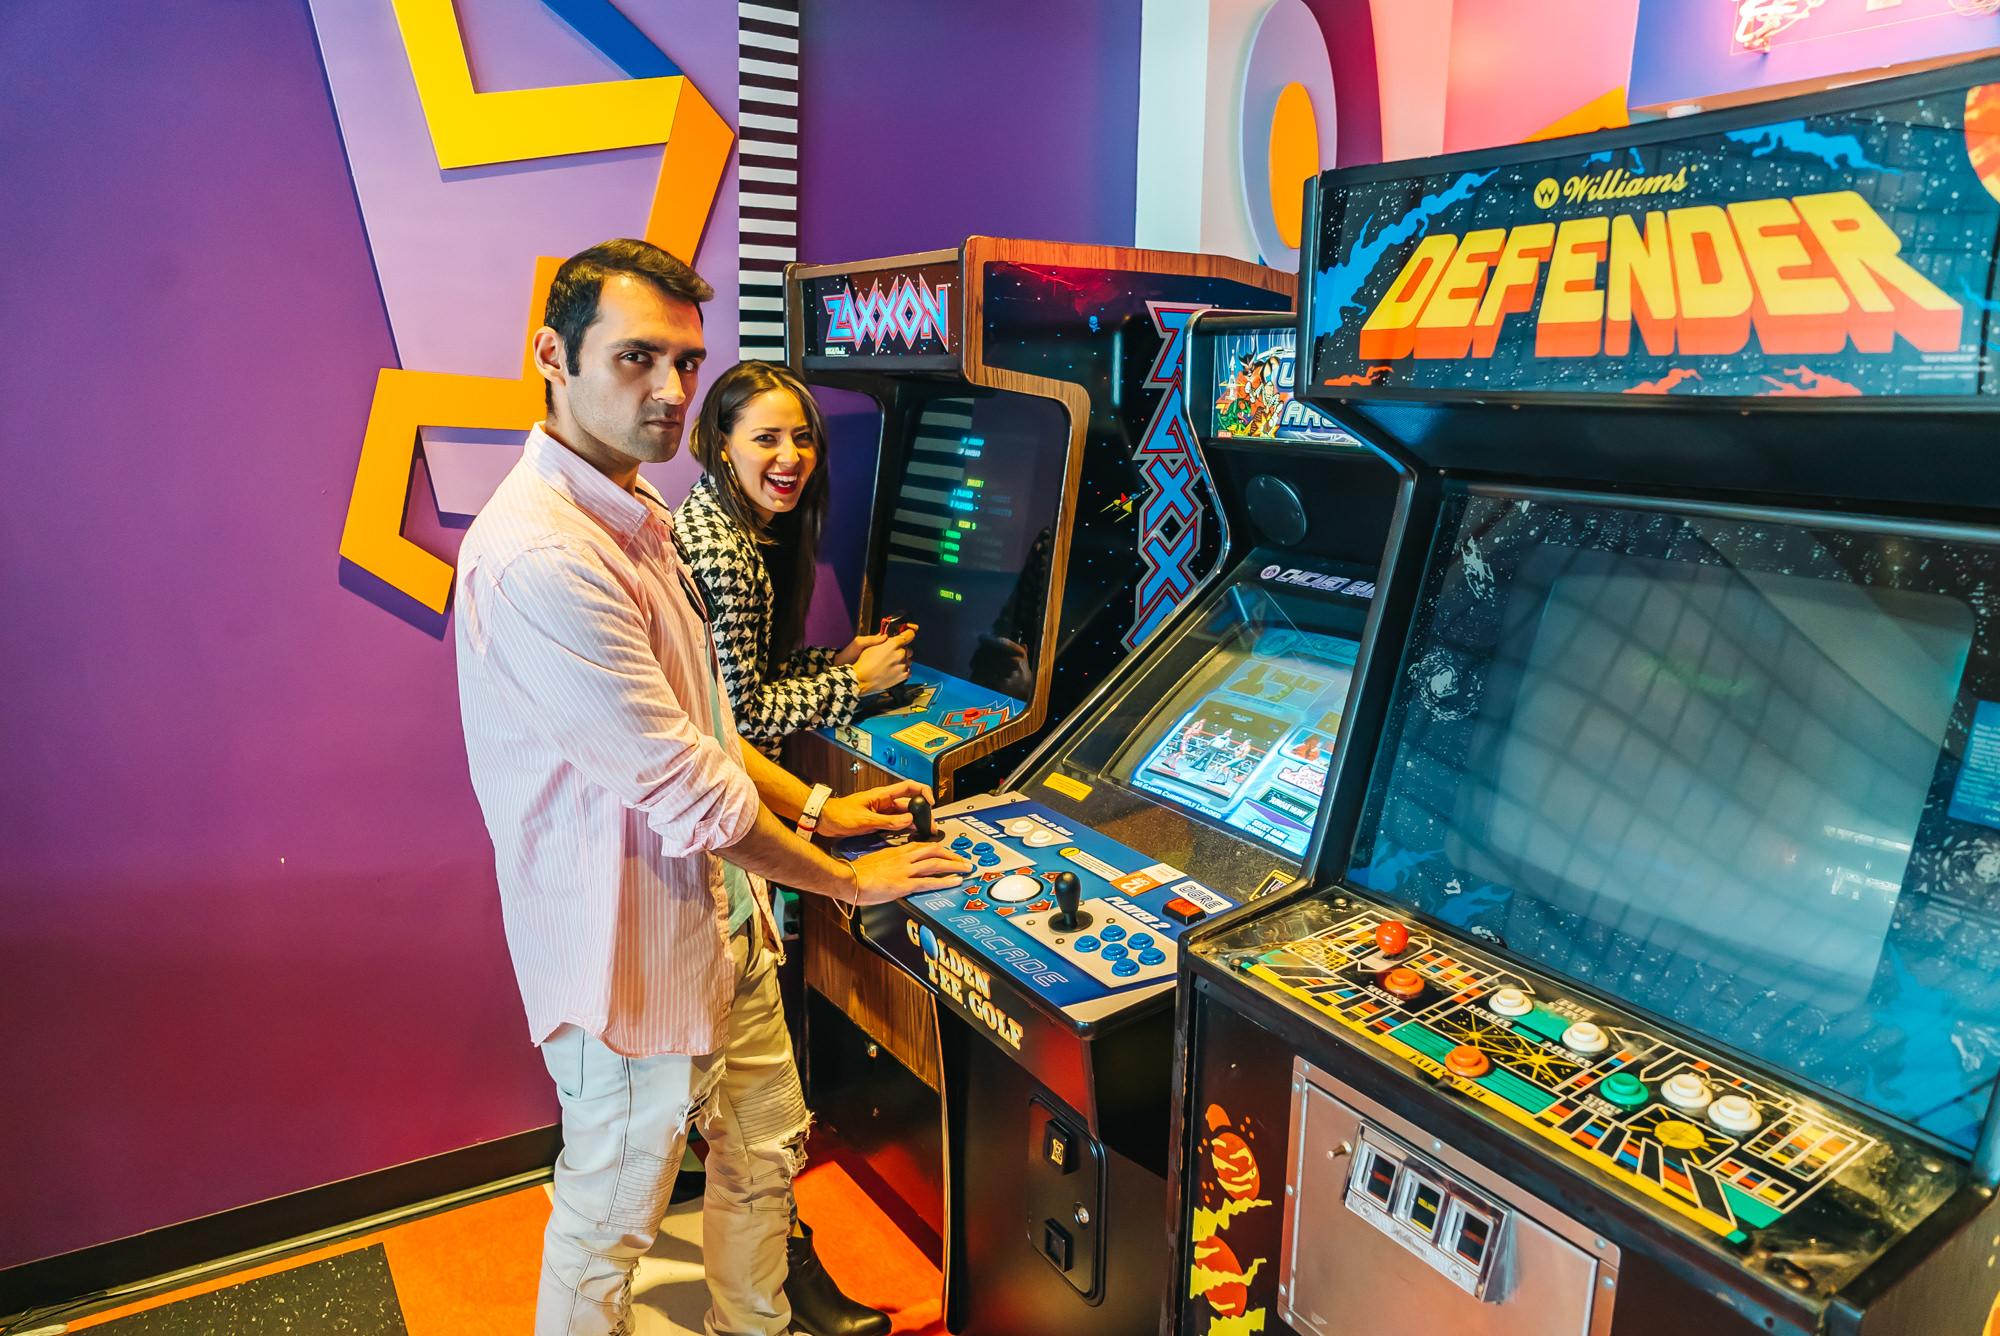 Enjoying the free arcade games